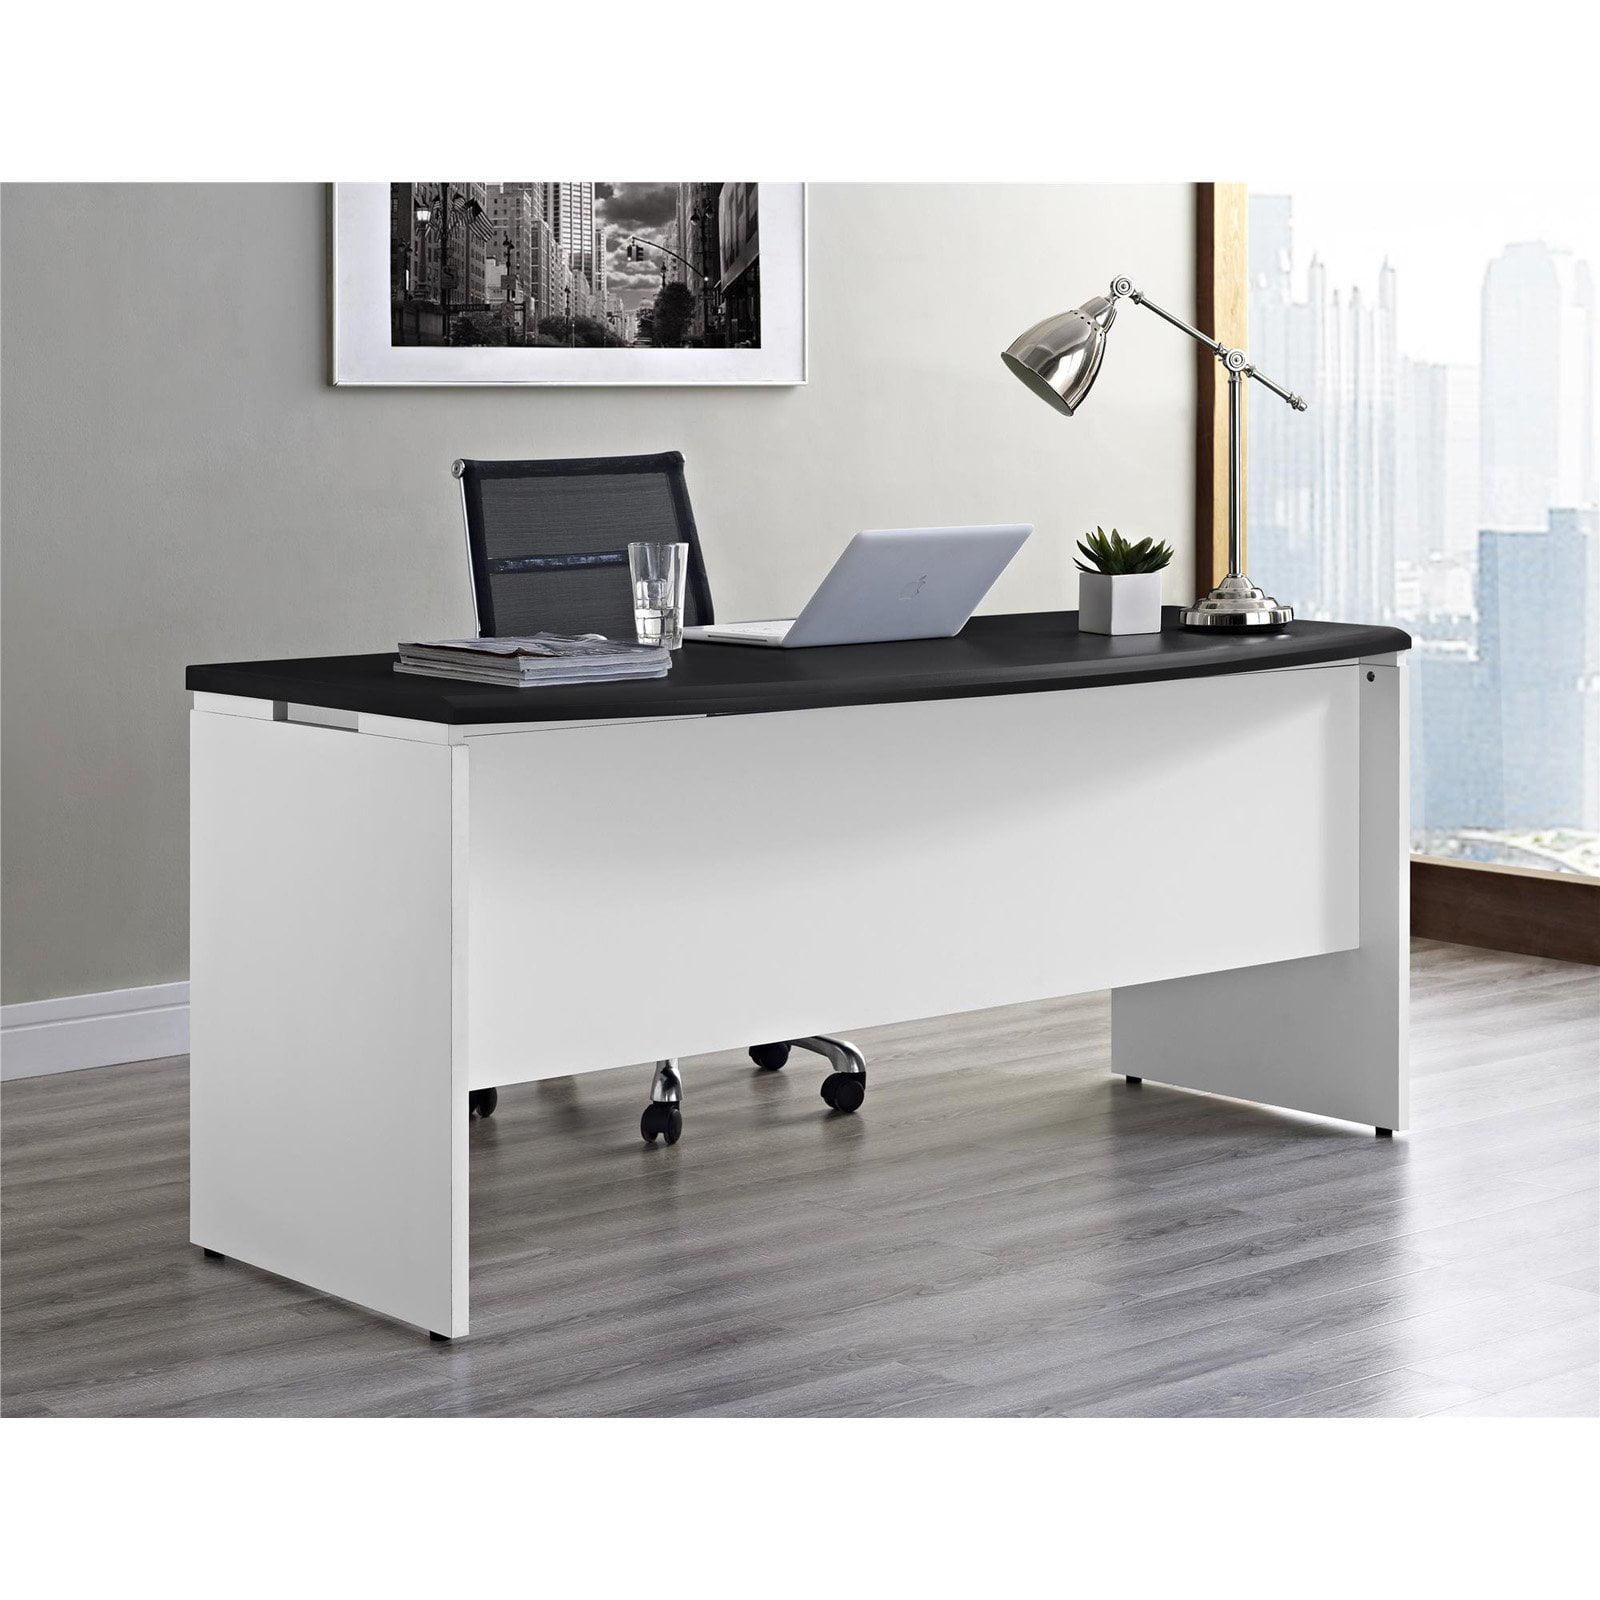 Ameriwood Home Pursuit Executive Desk, Cherry/Gray